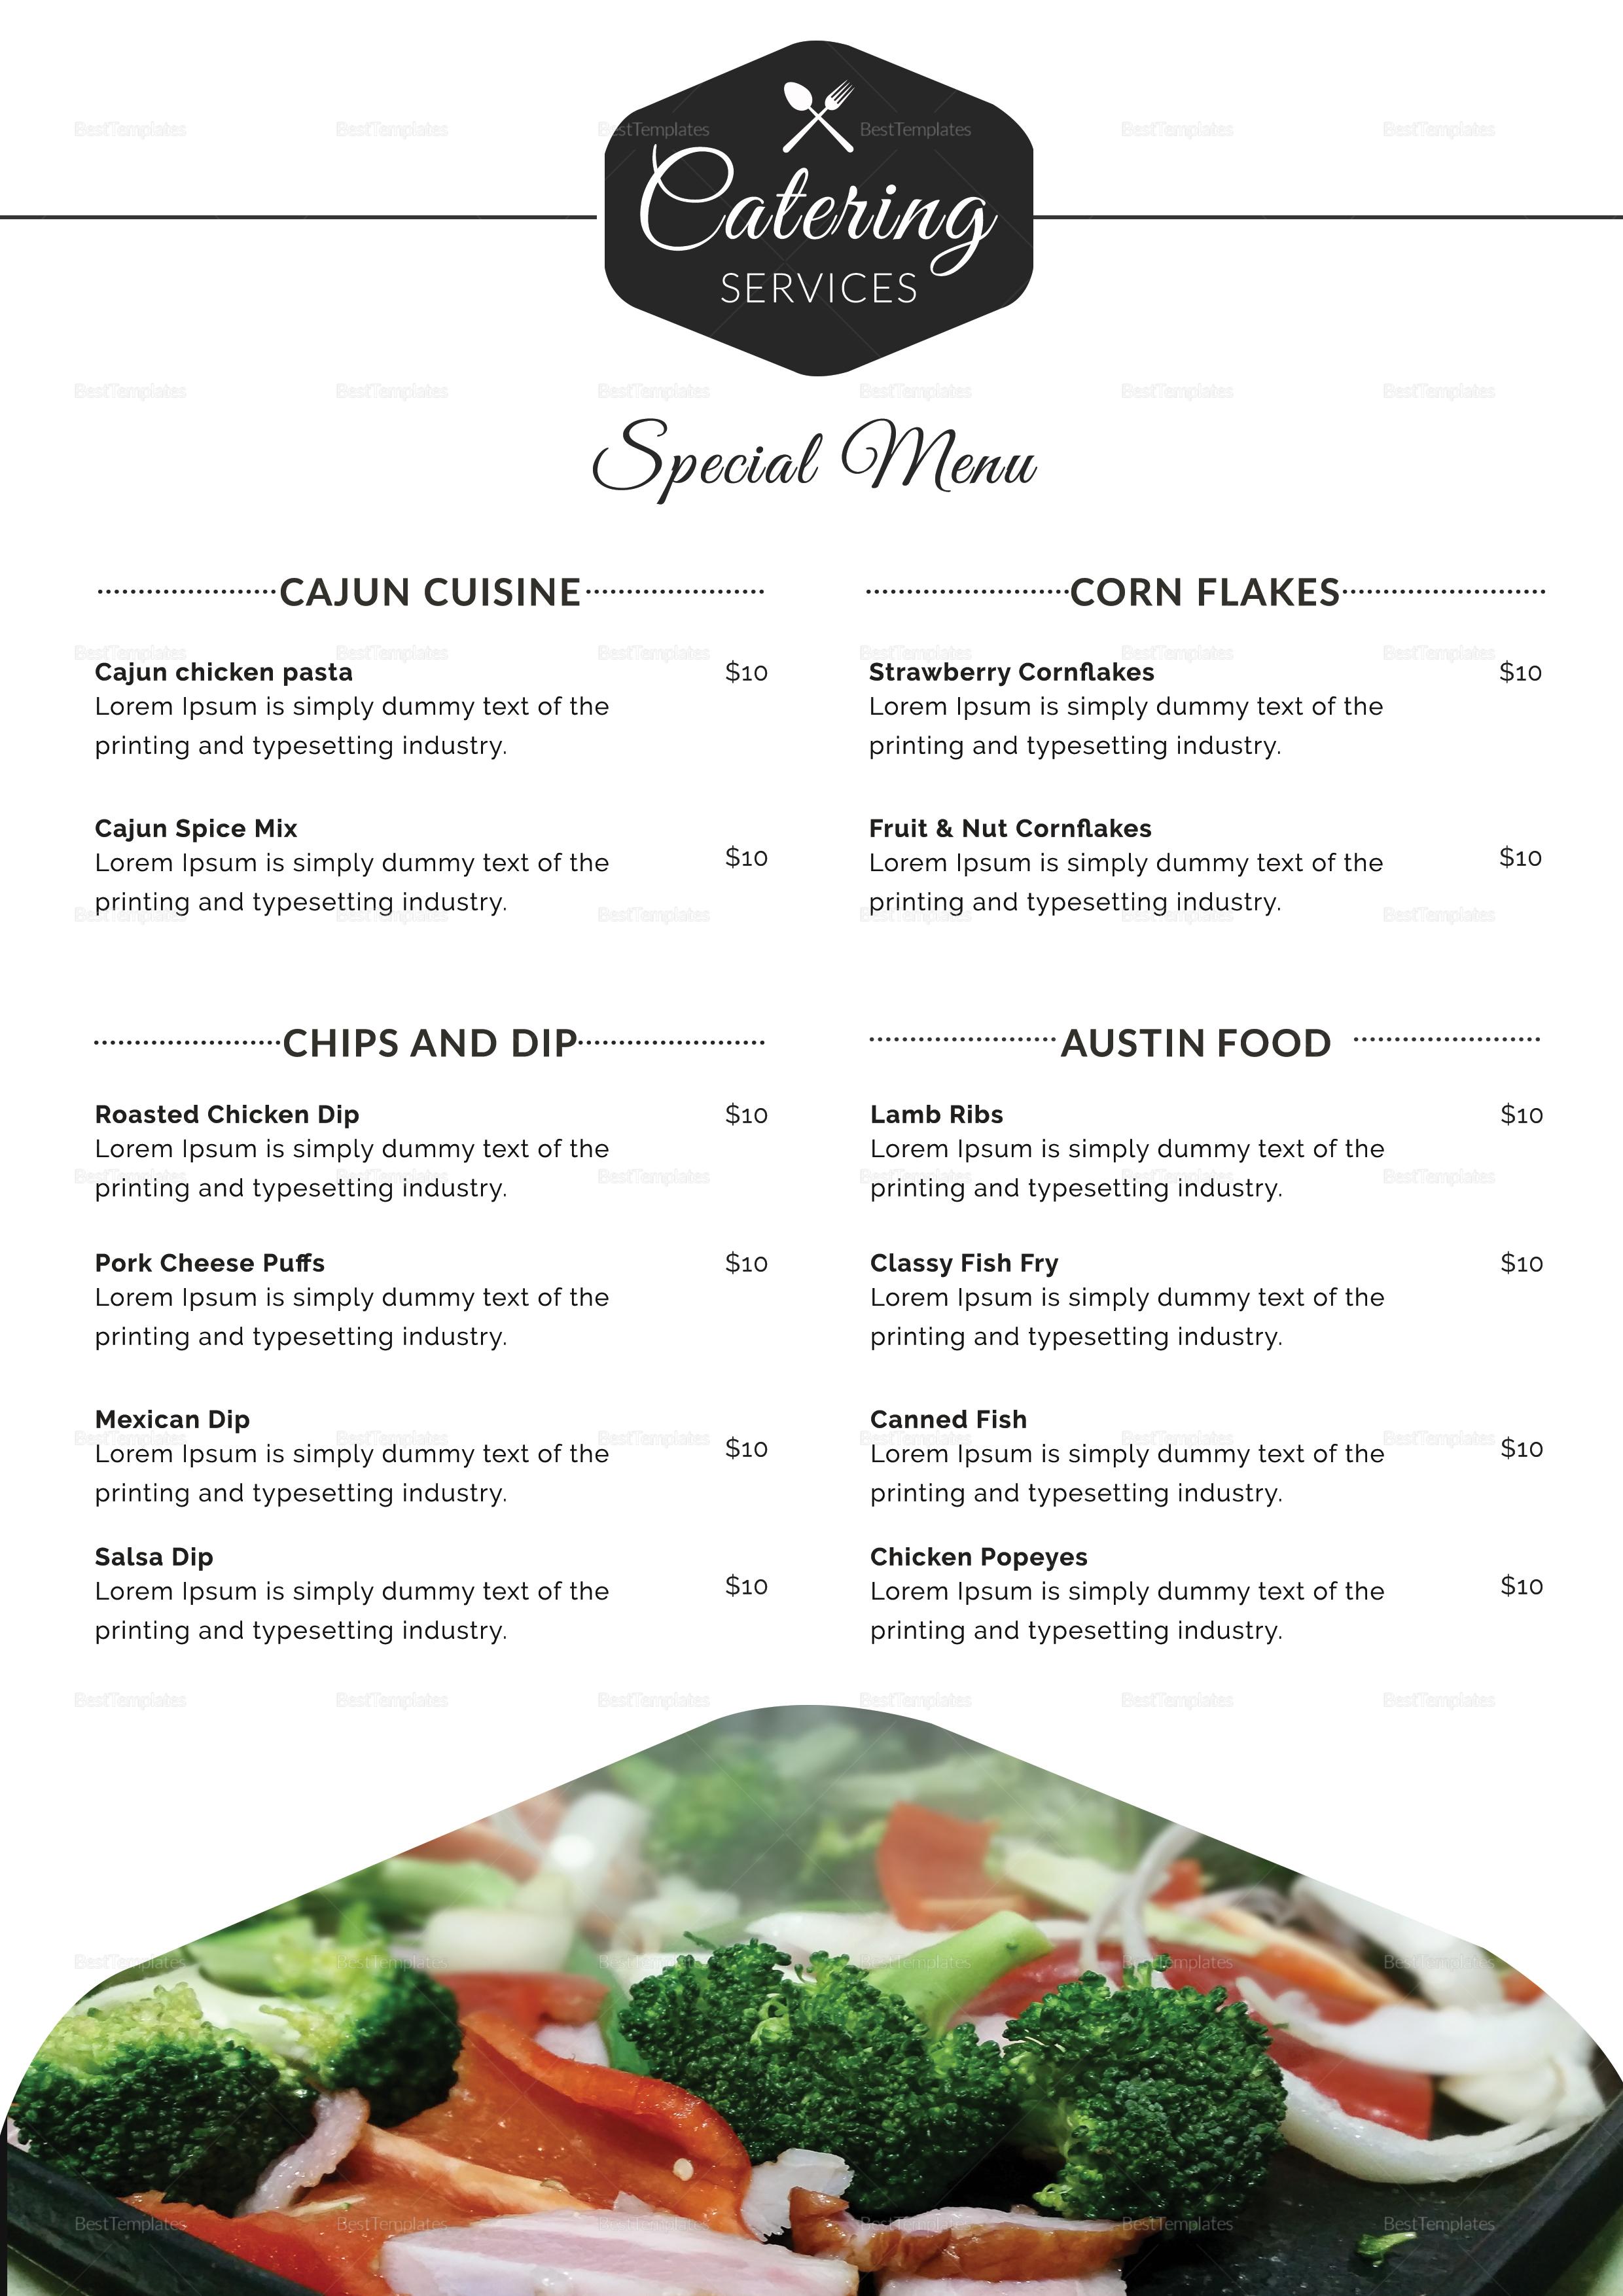 Food Catering Service Menu Design Template